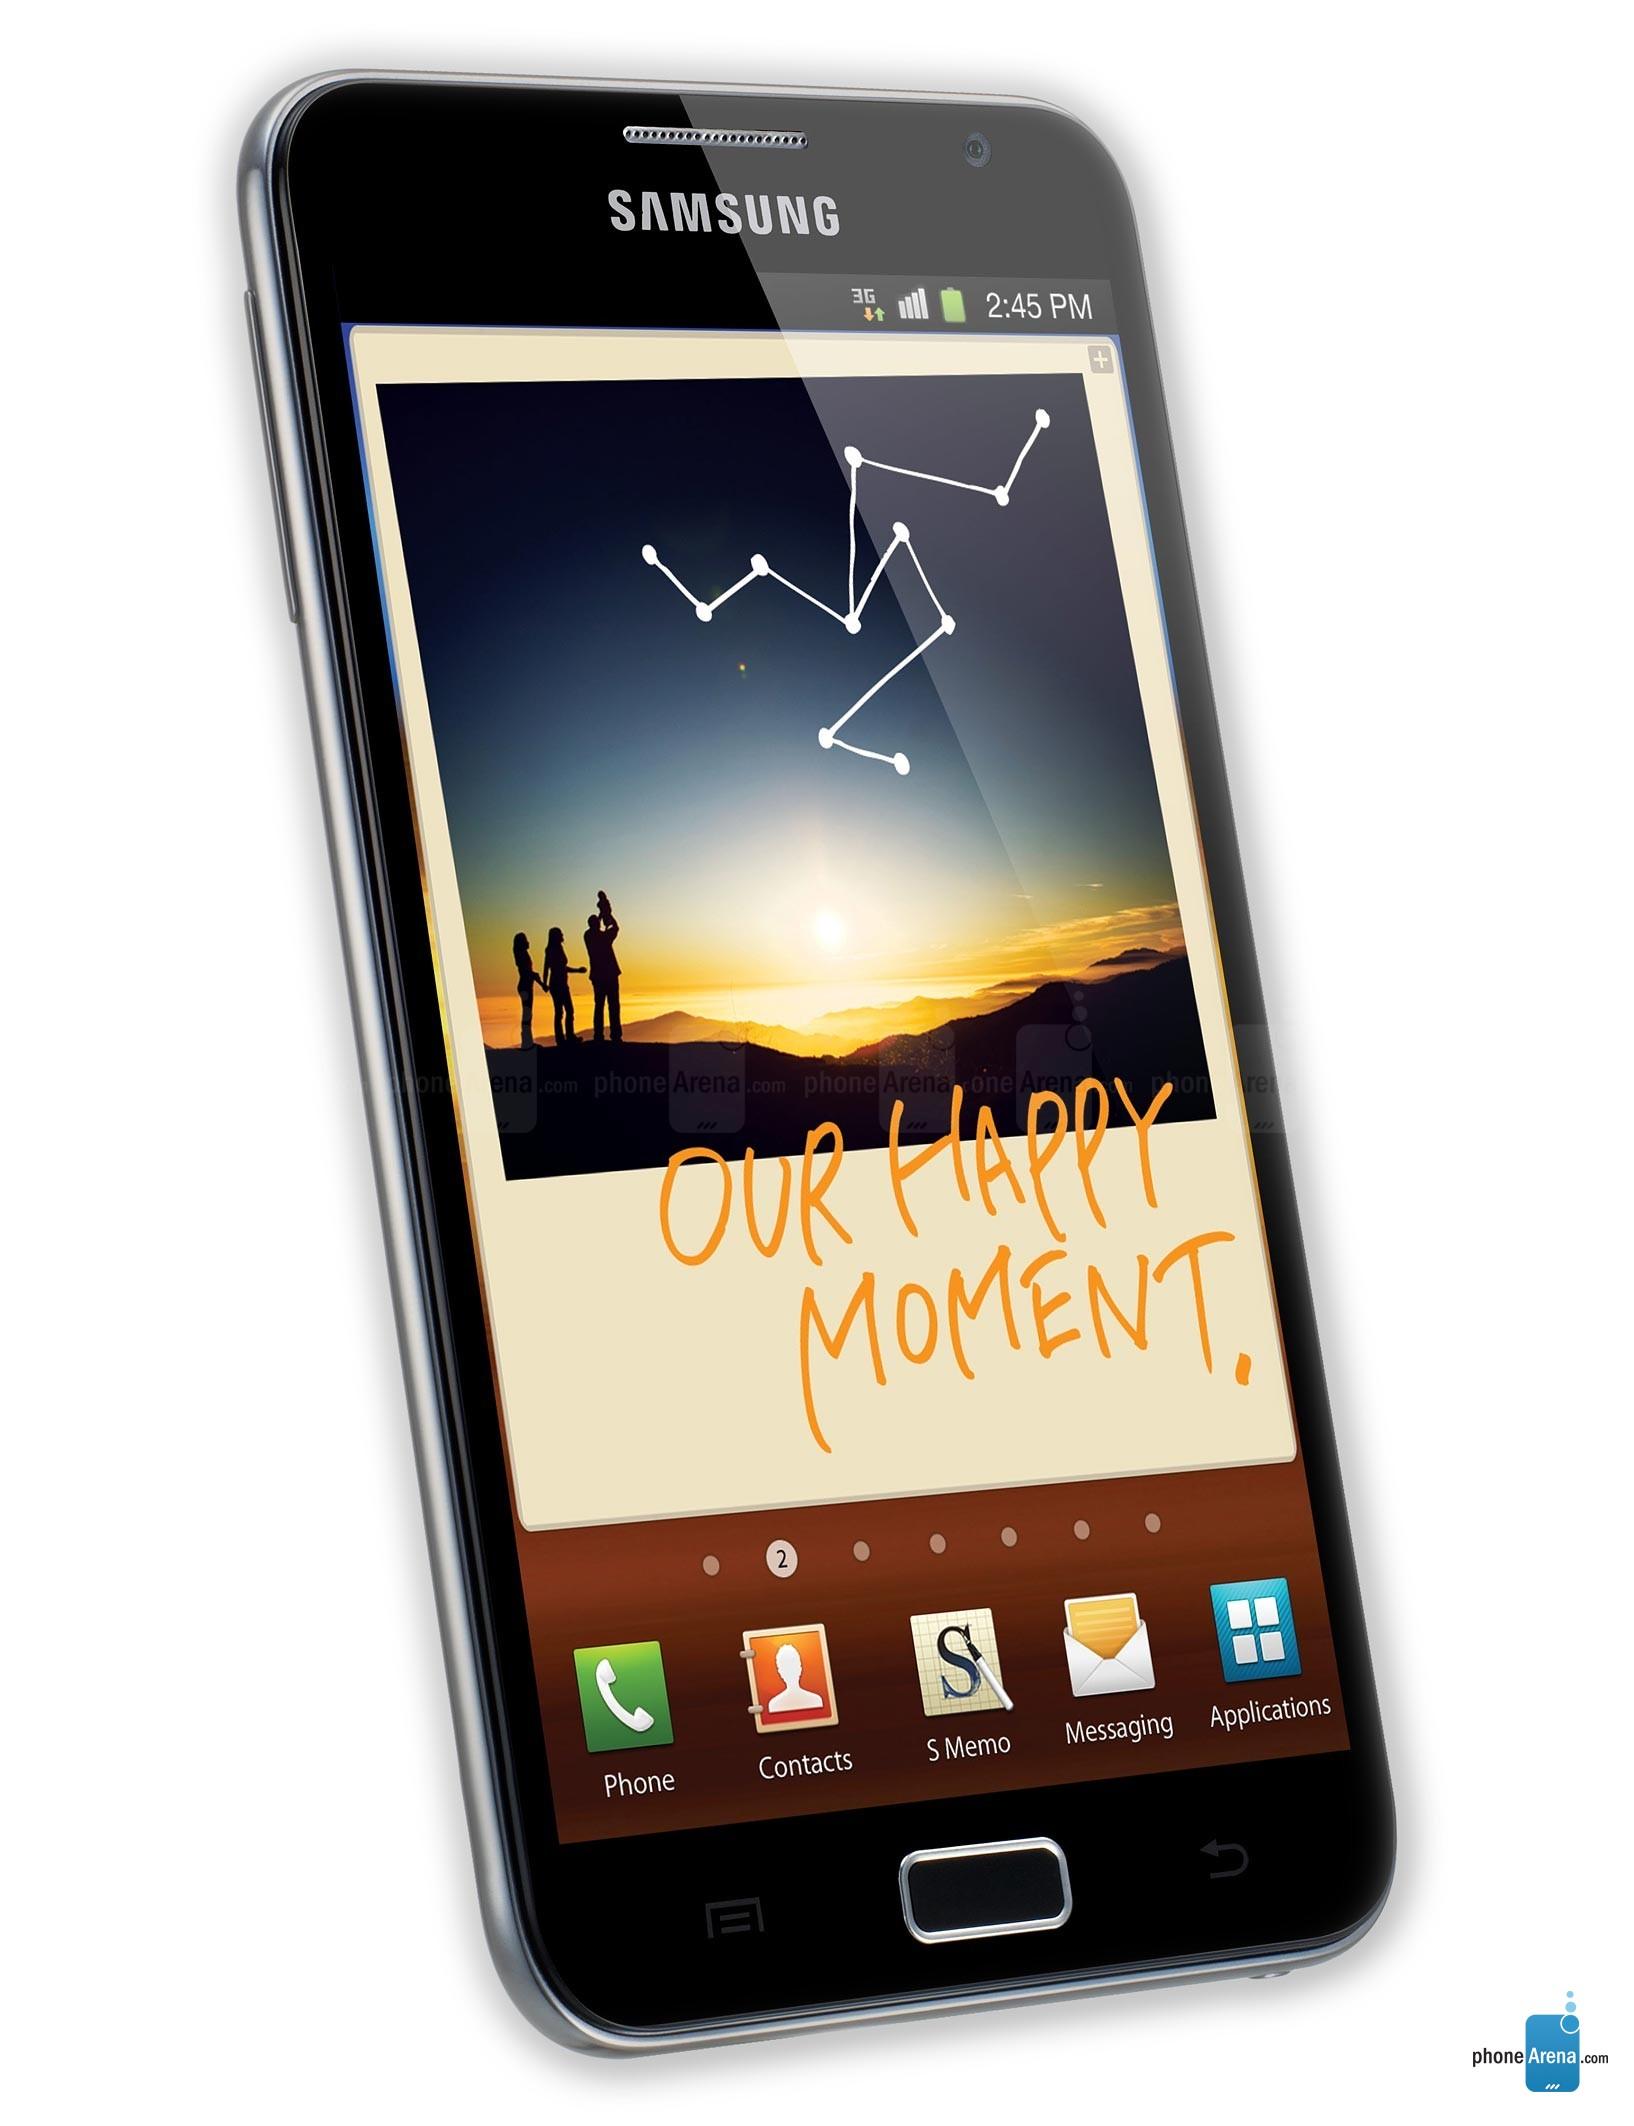 https://i-cdn.phonearena.com/images/phones/30874-xlarge/Samsung-GALAXY-Note-2.jpg